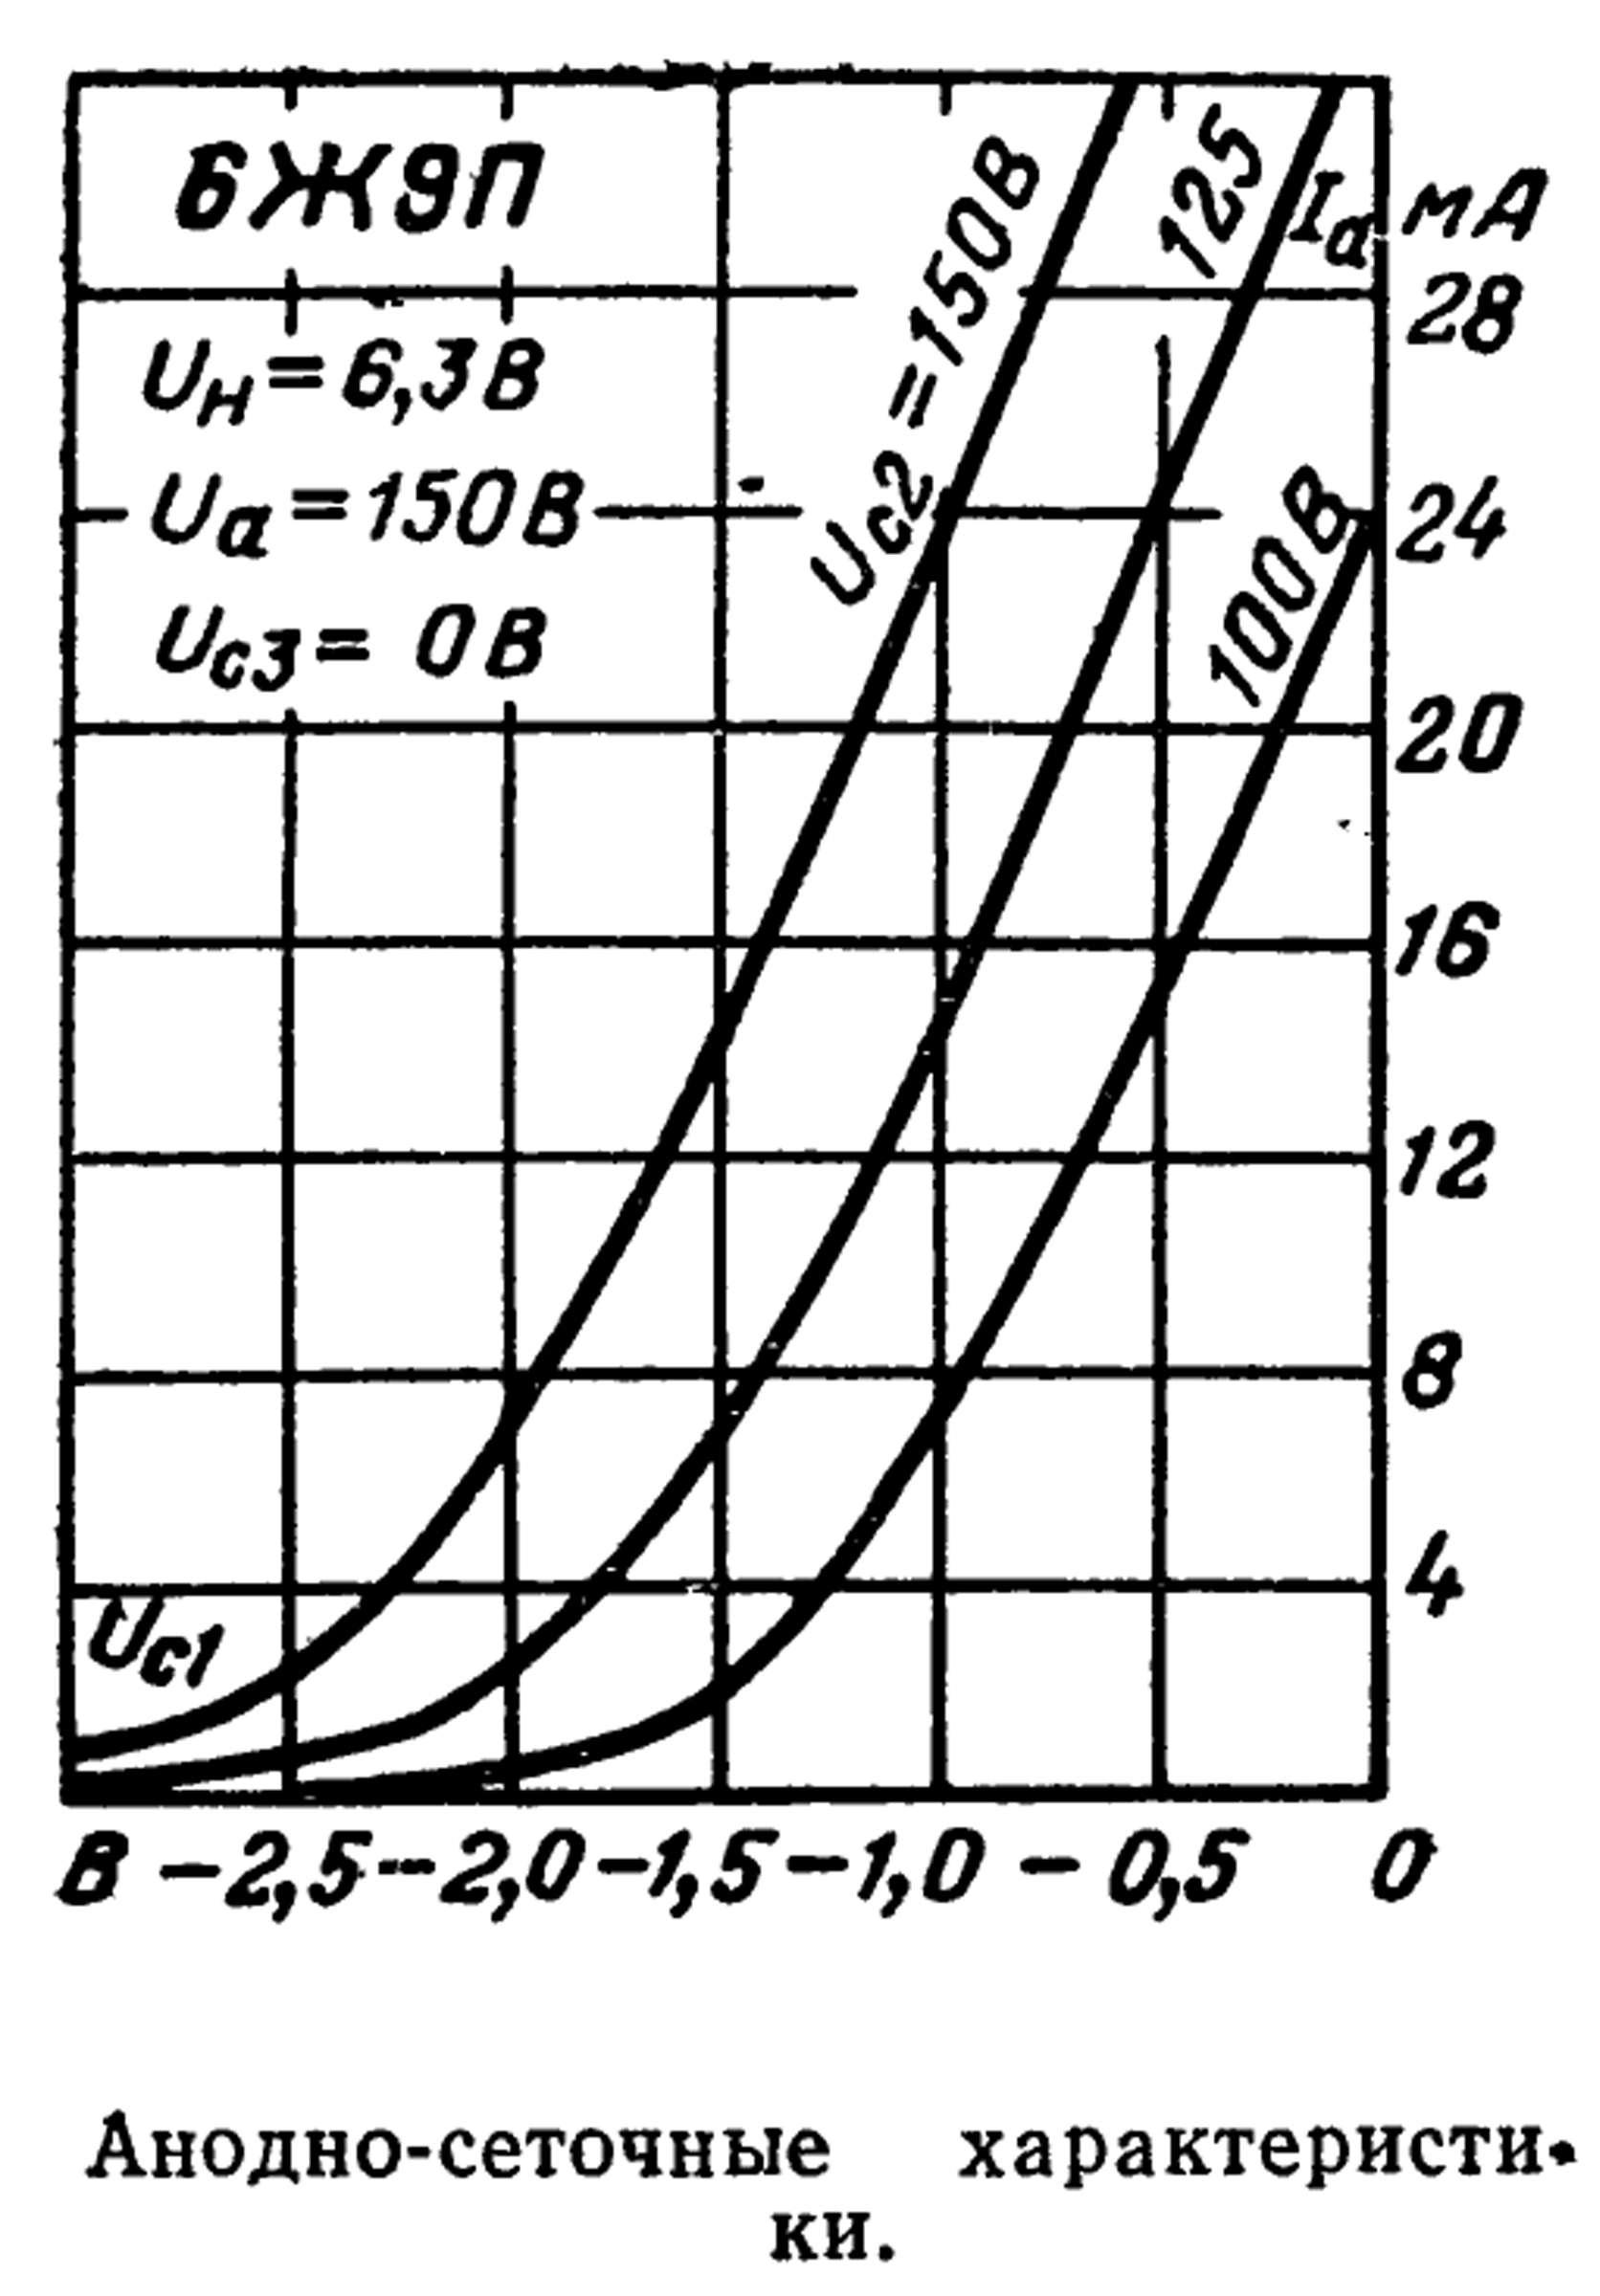 Параметры радиолампы 6Ж9П